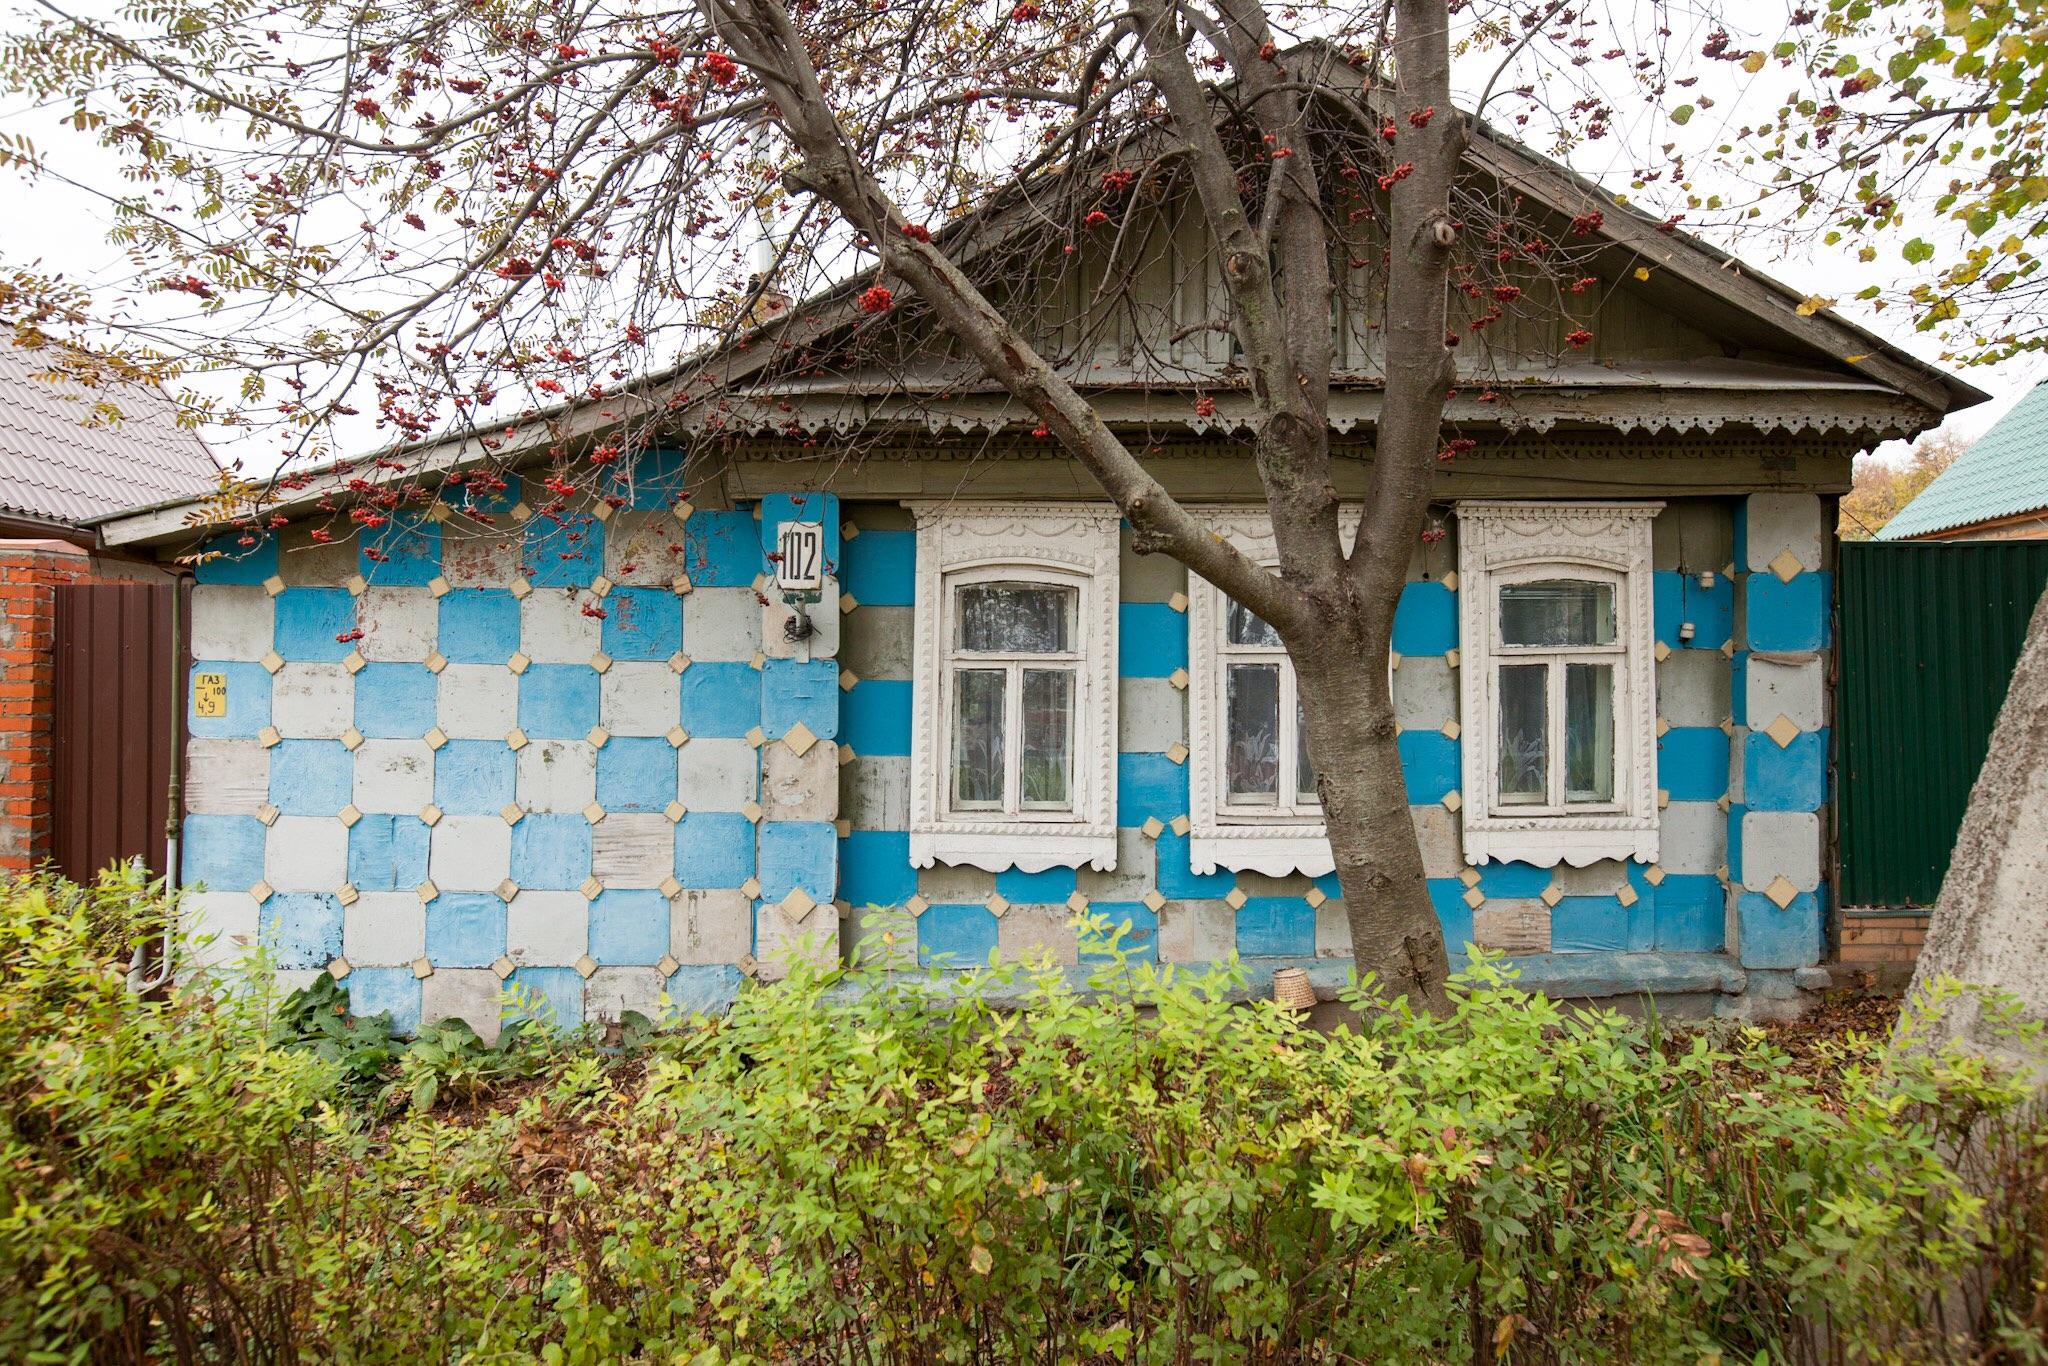 Необычный деревянный дом, покрытый сидушками от табуреток